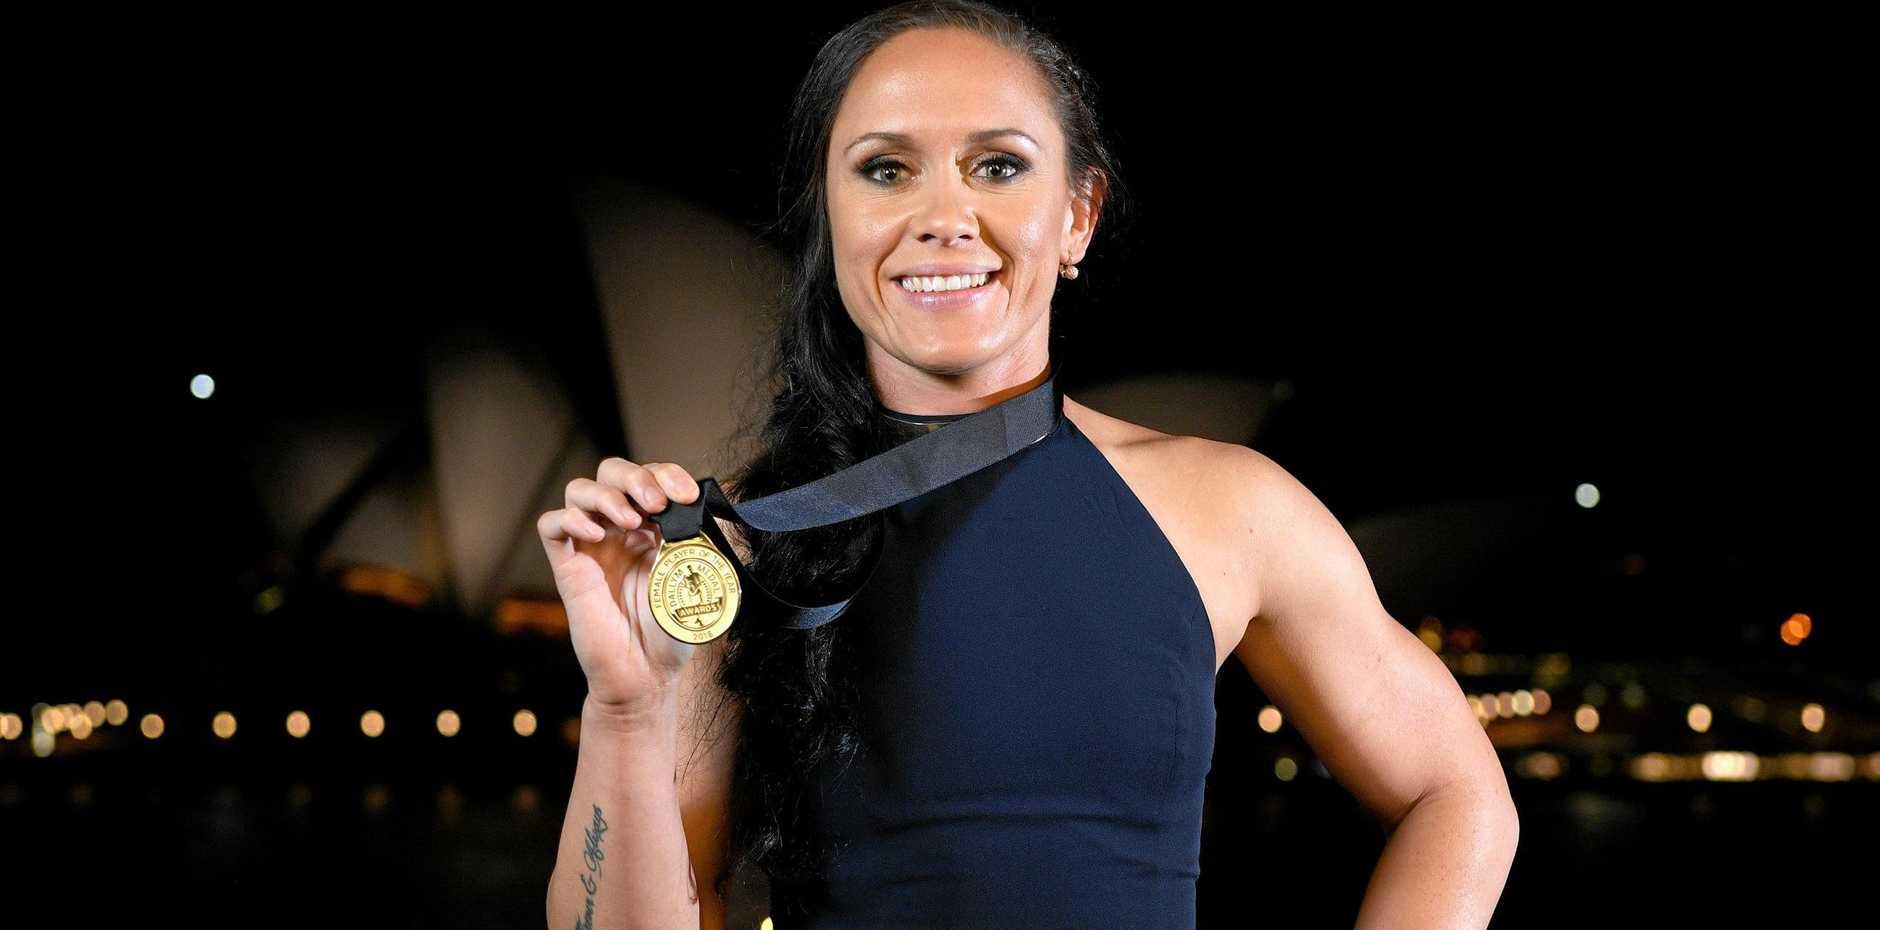 Brisbane Broncos NRLW player Brittany Breayley won the women's Dally M Medal for 2018 after a stellar season.